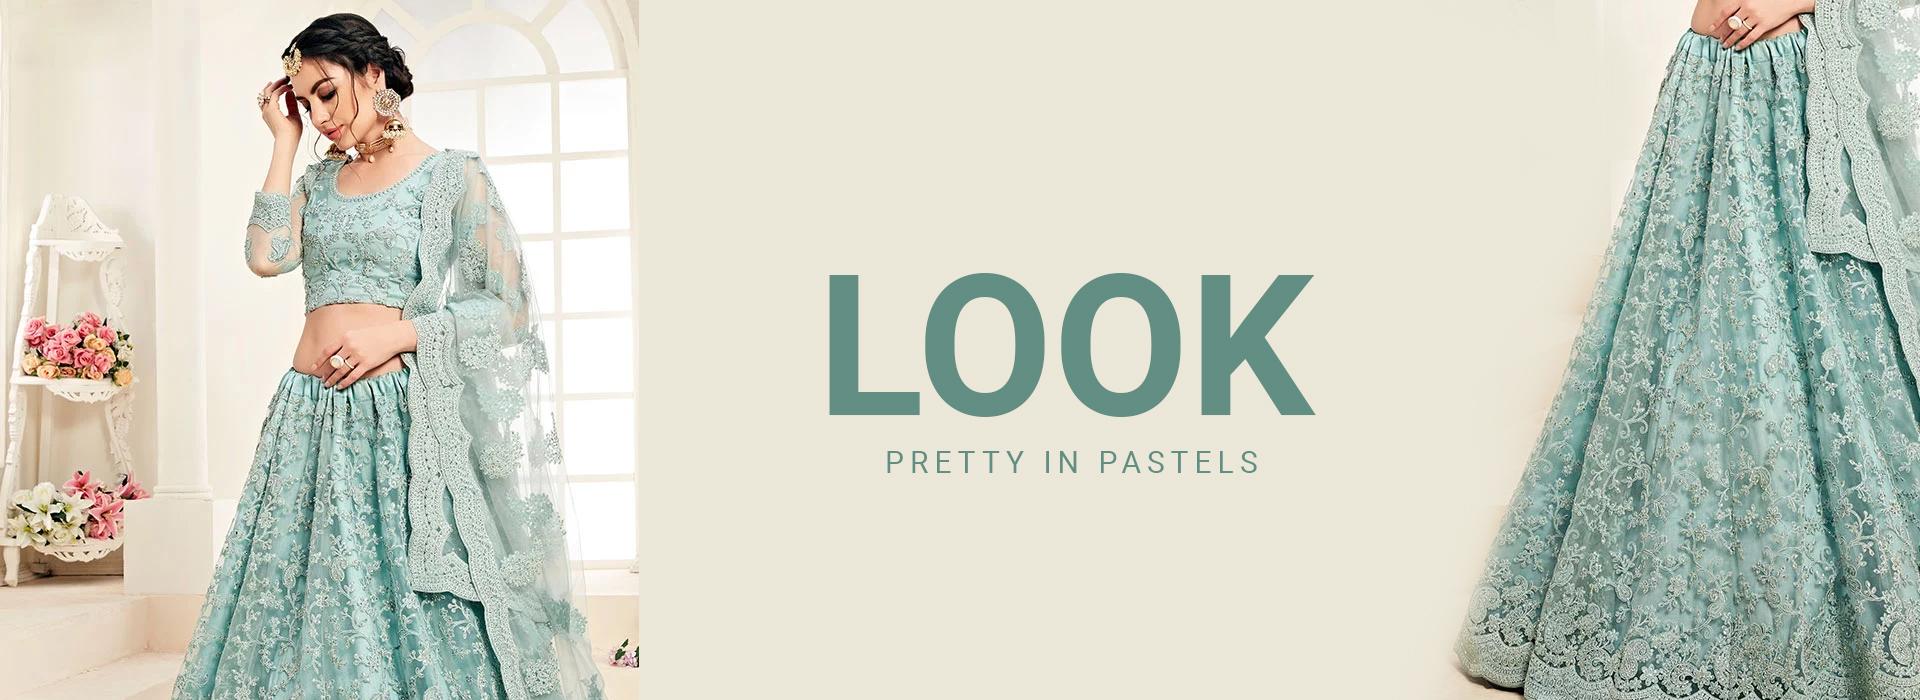 Look Pretty in Pastels